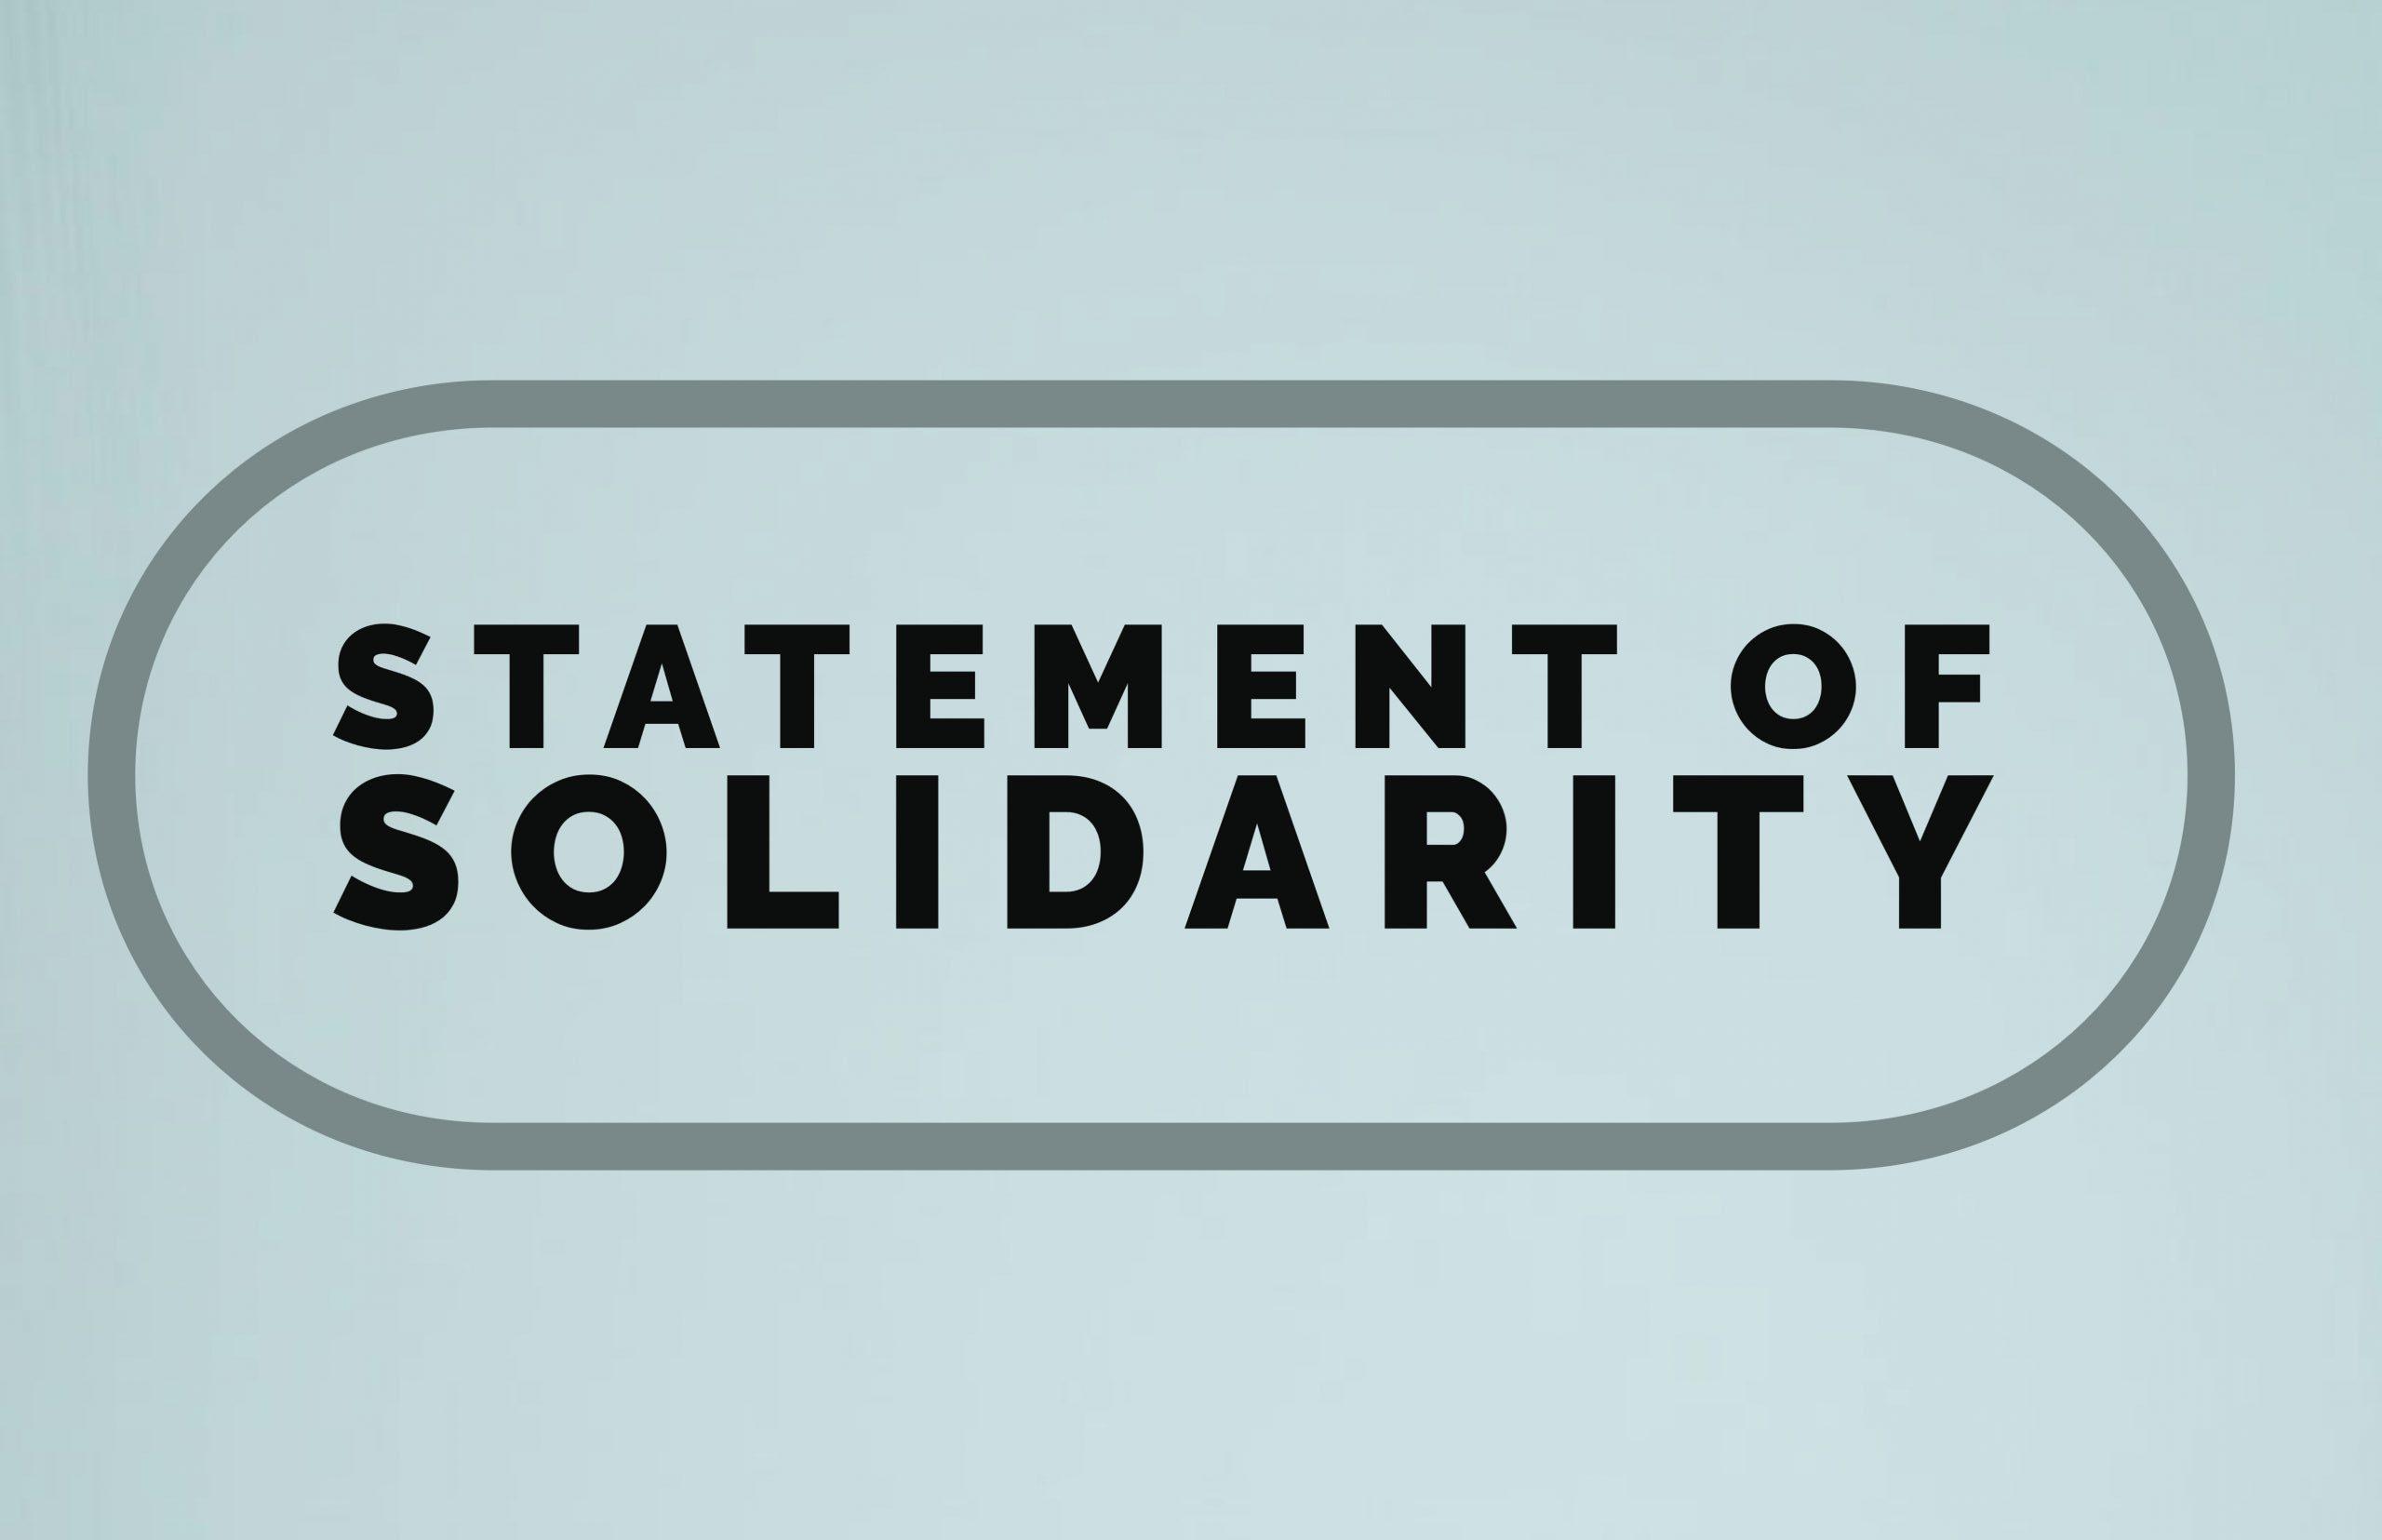 statement of solidarity